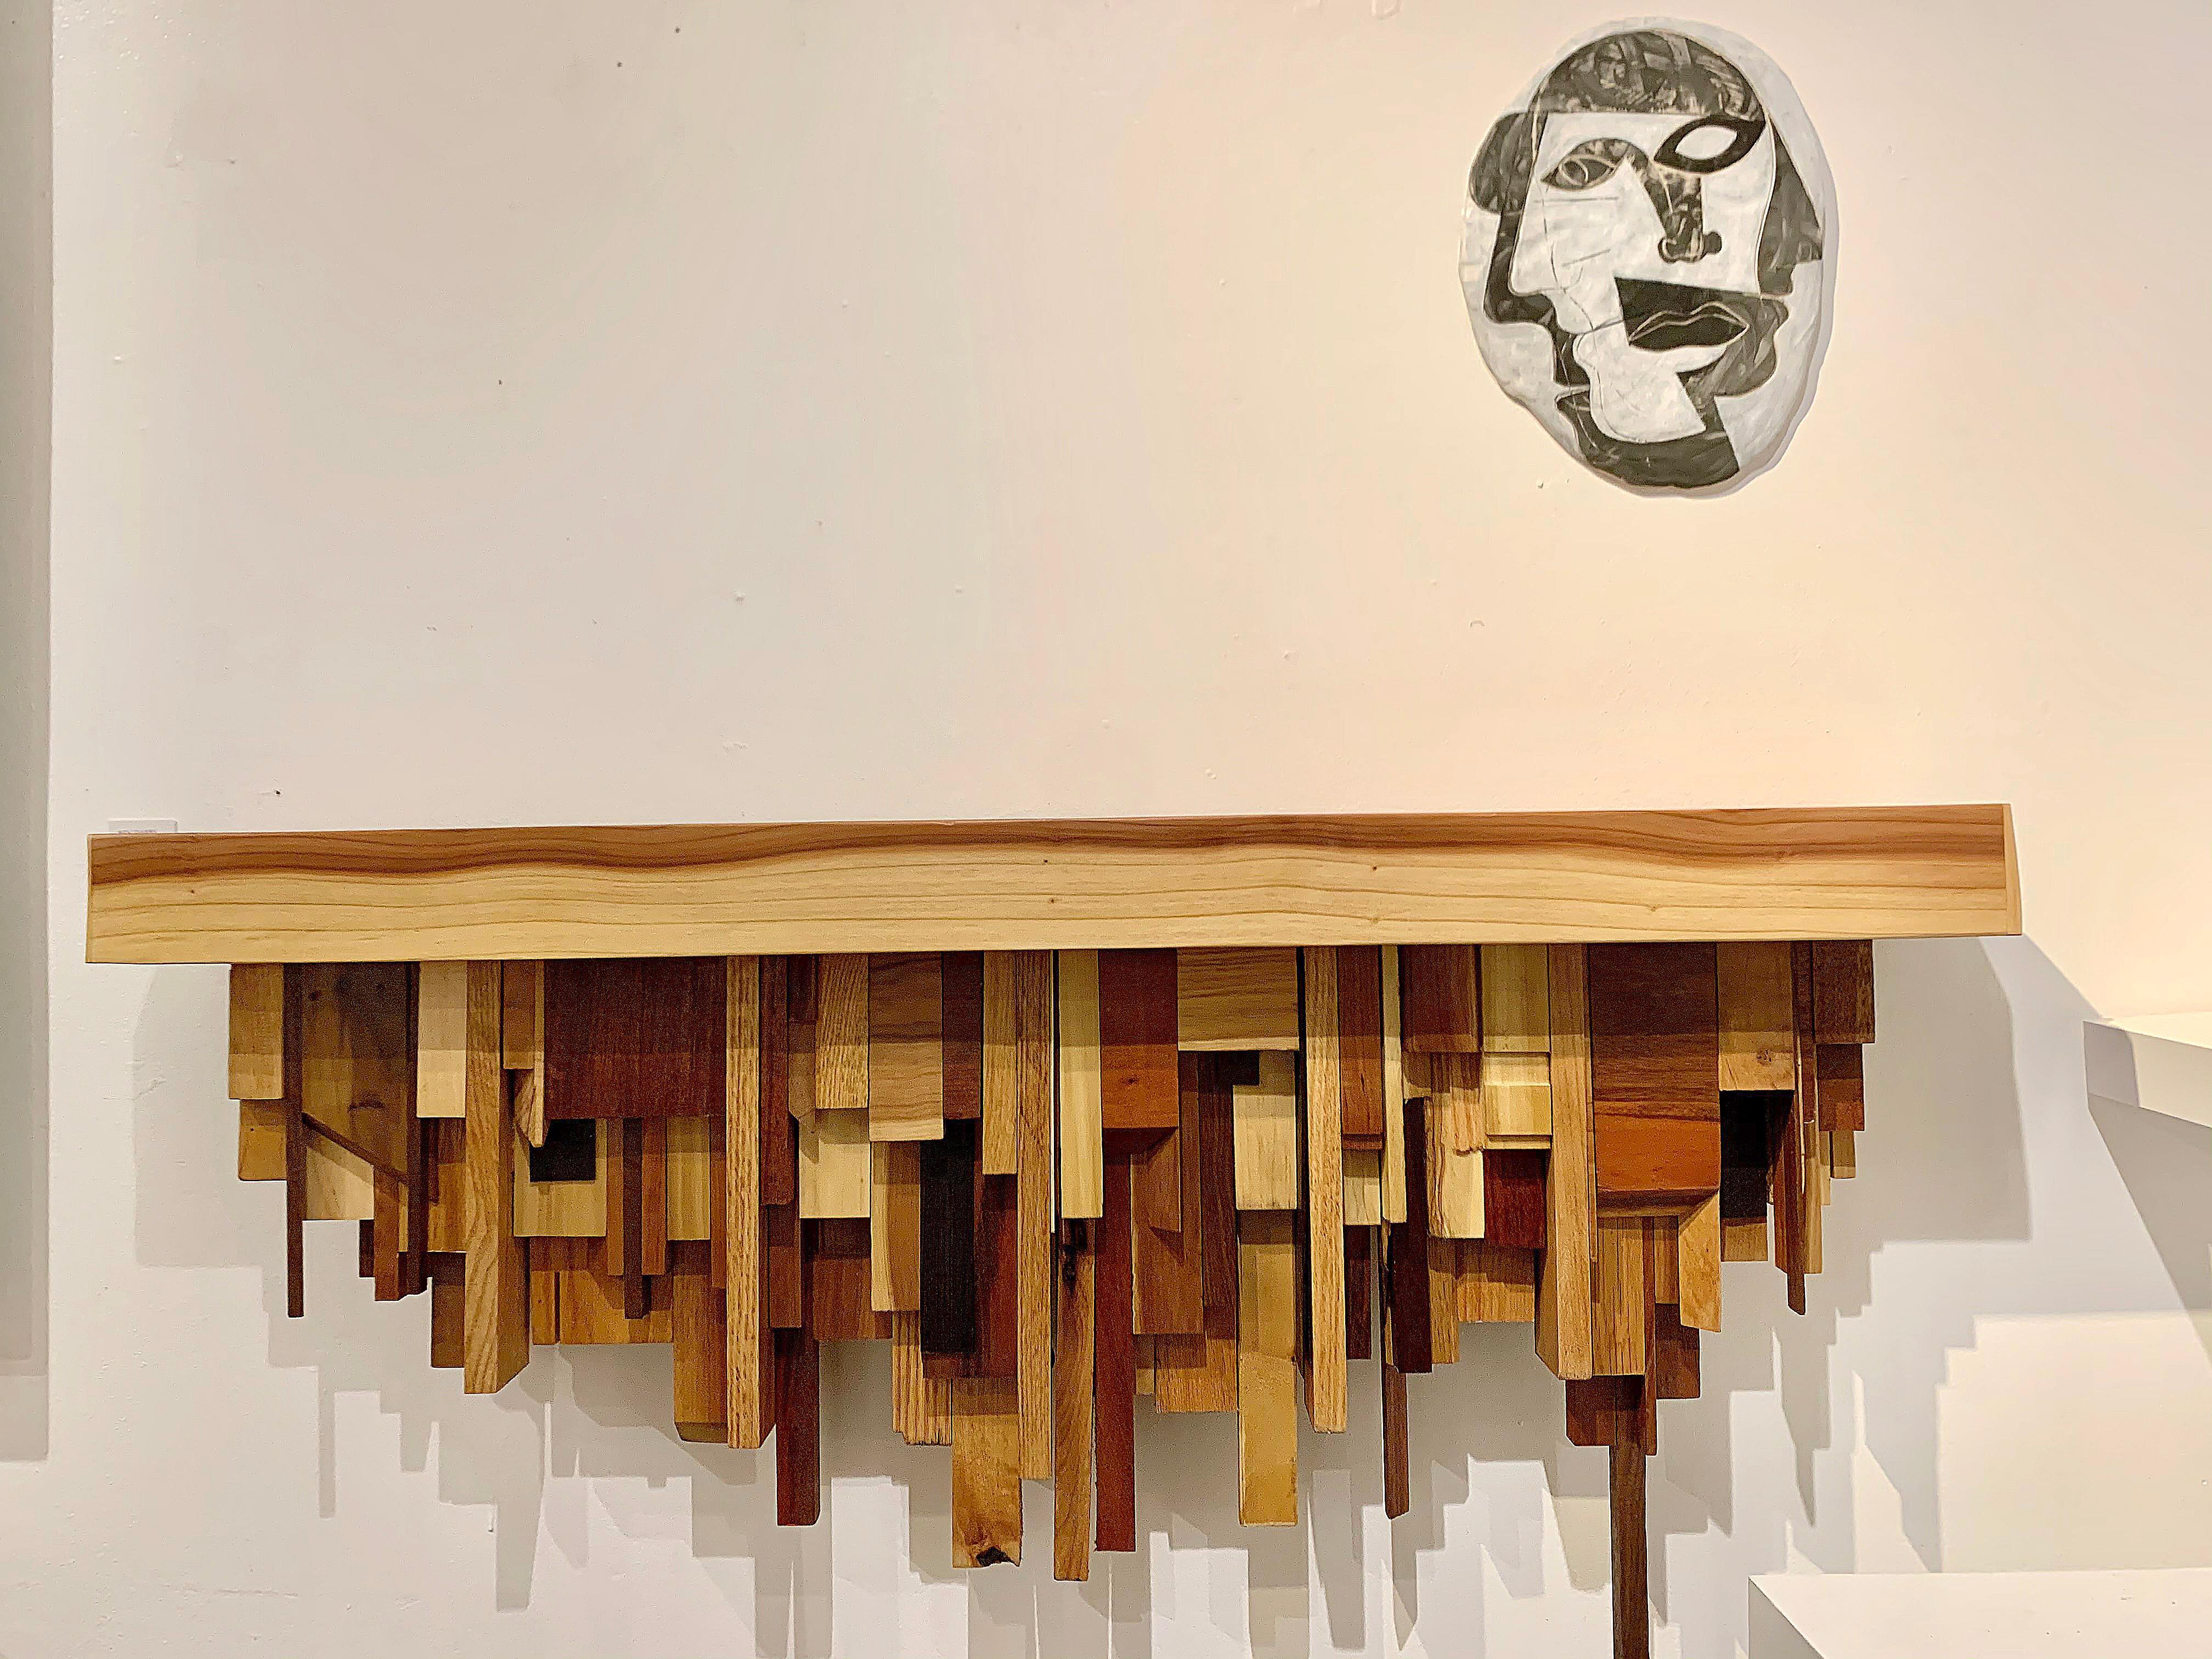 Mixed-media Medium Wood Cityscape Shelf or Mantel by Artist Ben Darby, 2020